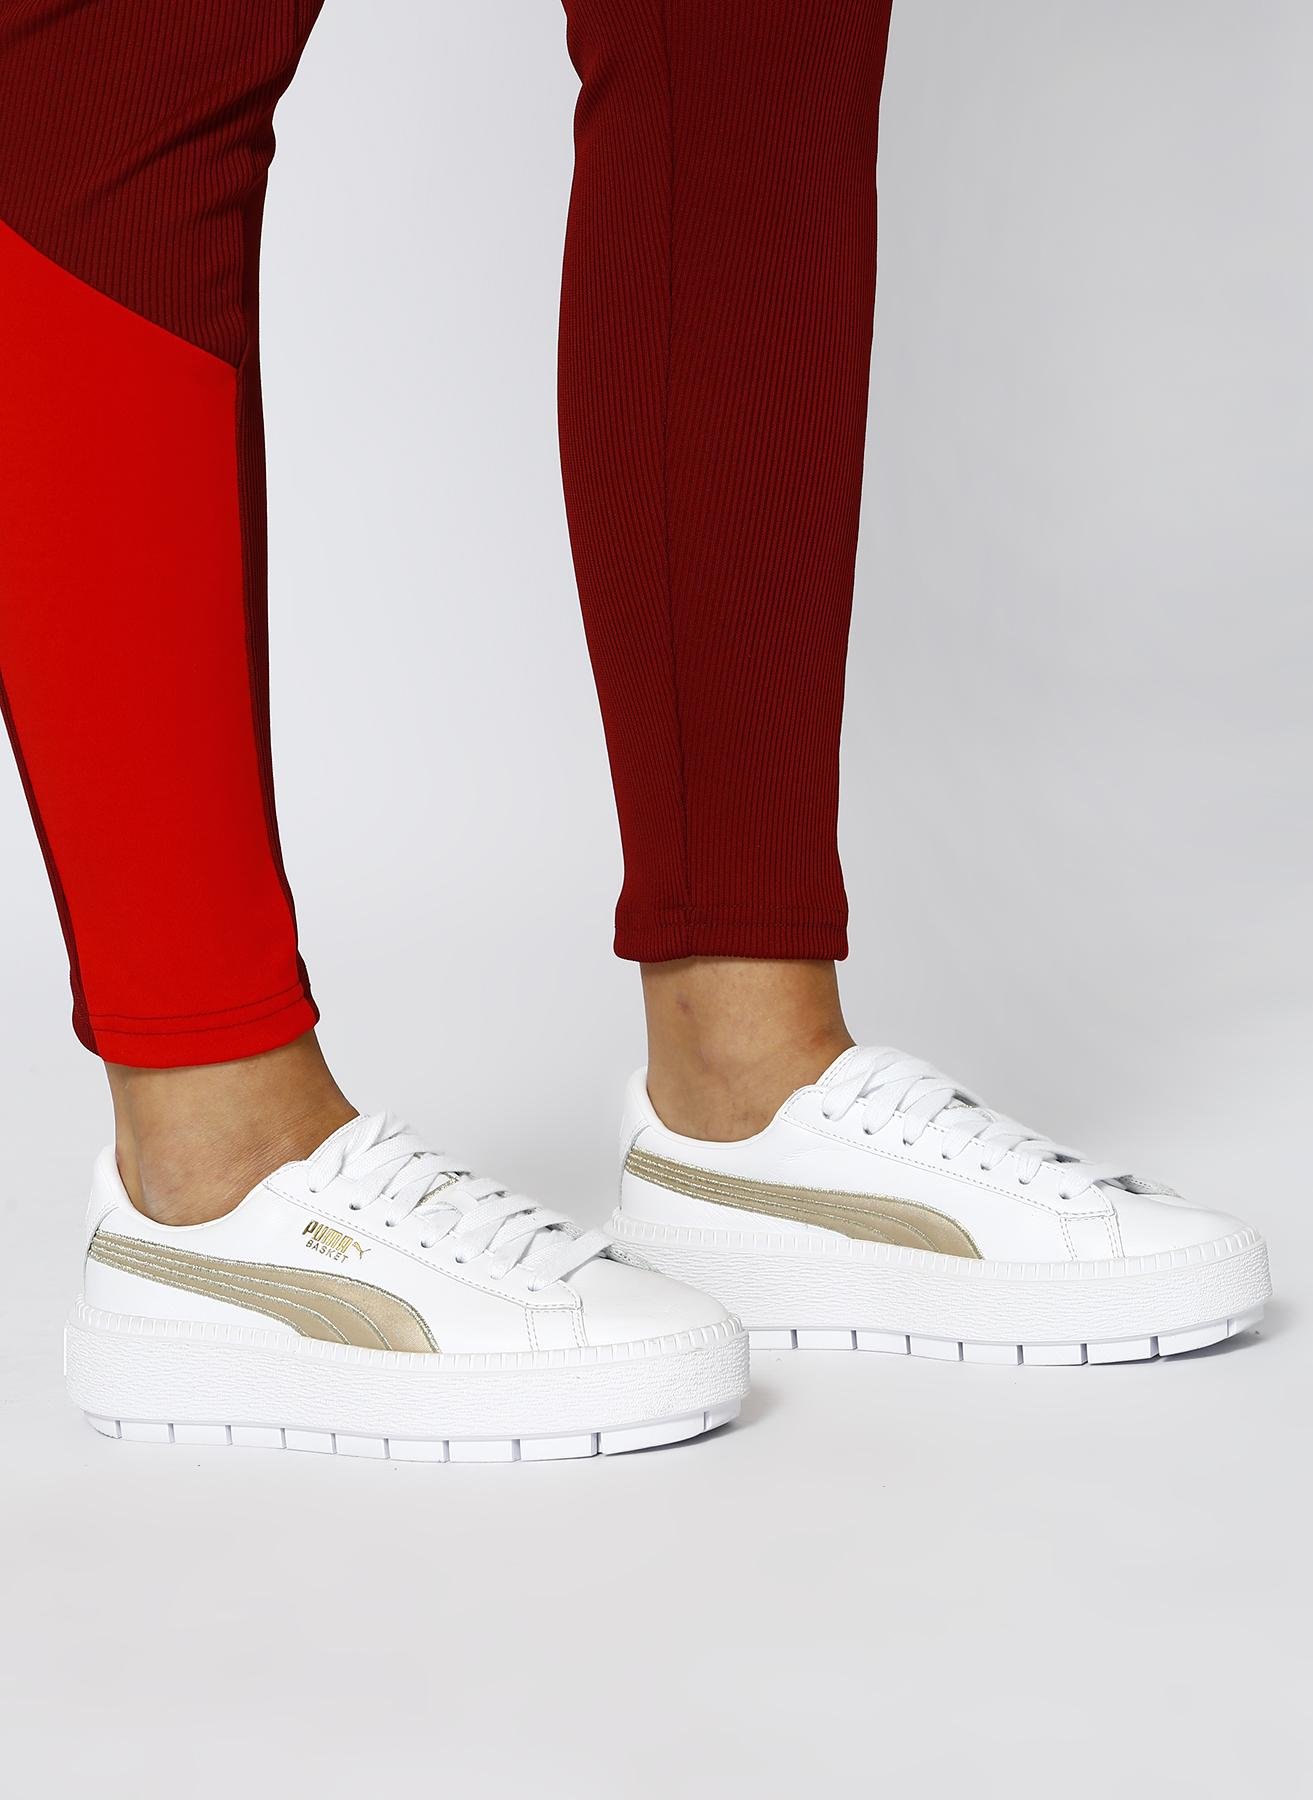 Puma Platform Trace Varsity Wn s Lifestyle Ayakkabı 37.5 5001632650003 Ürün Resmi